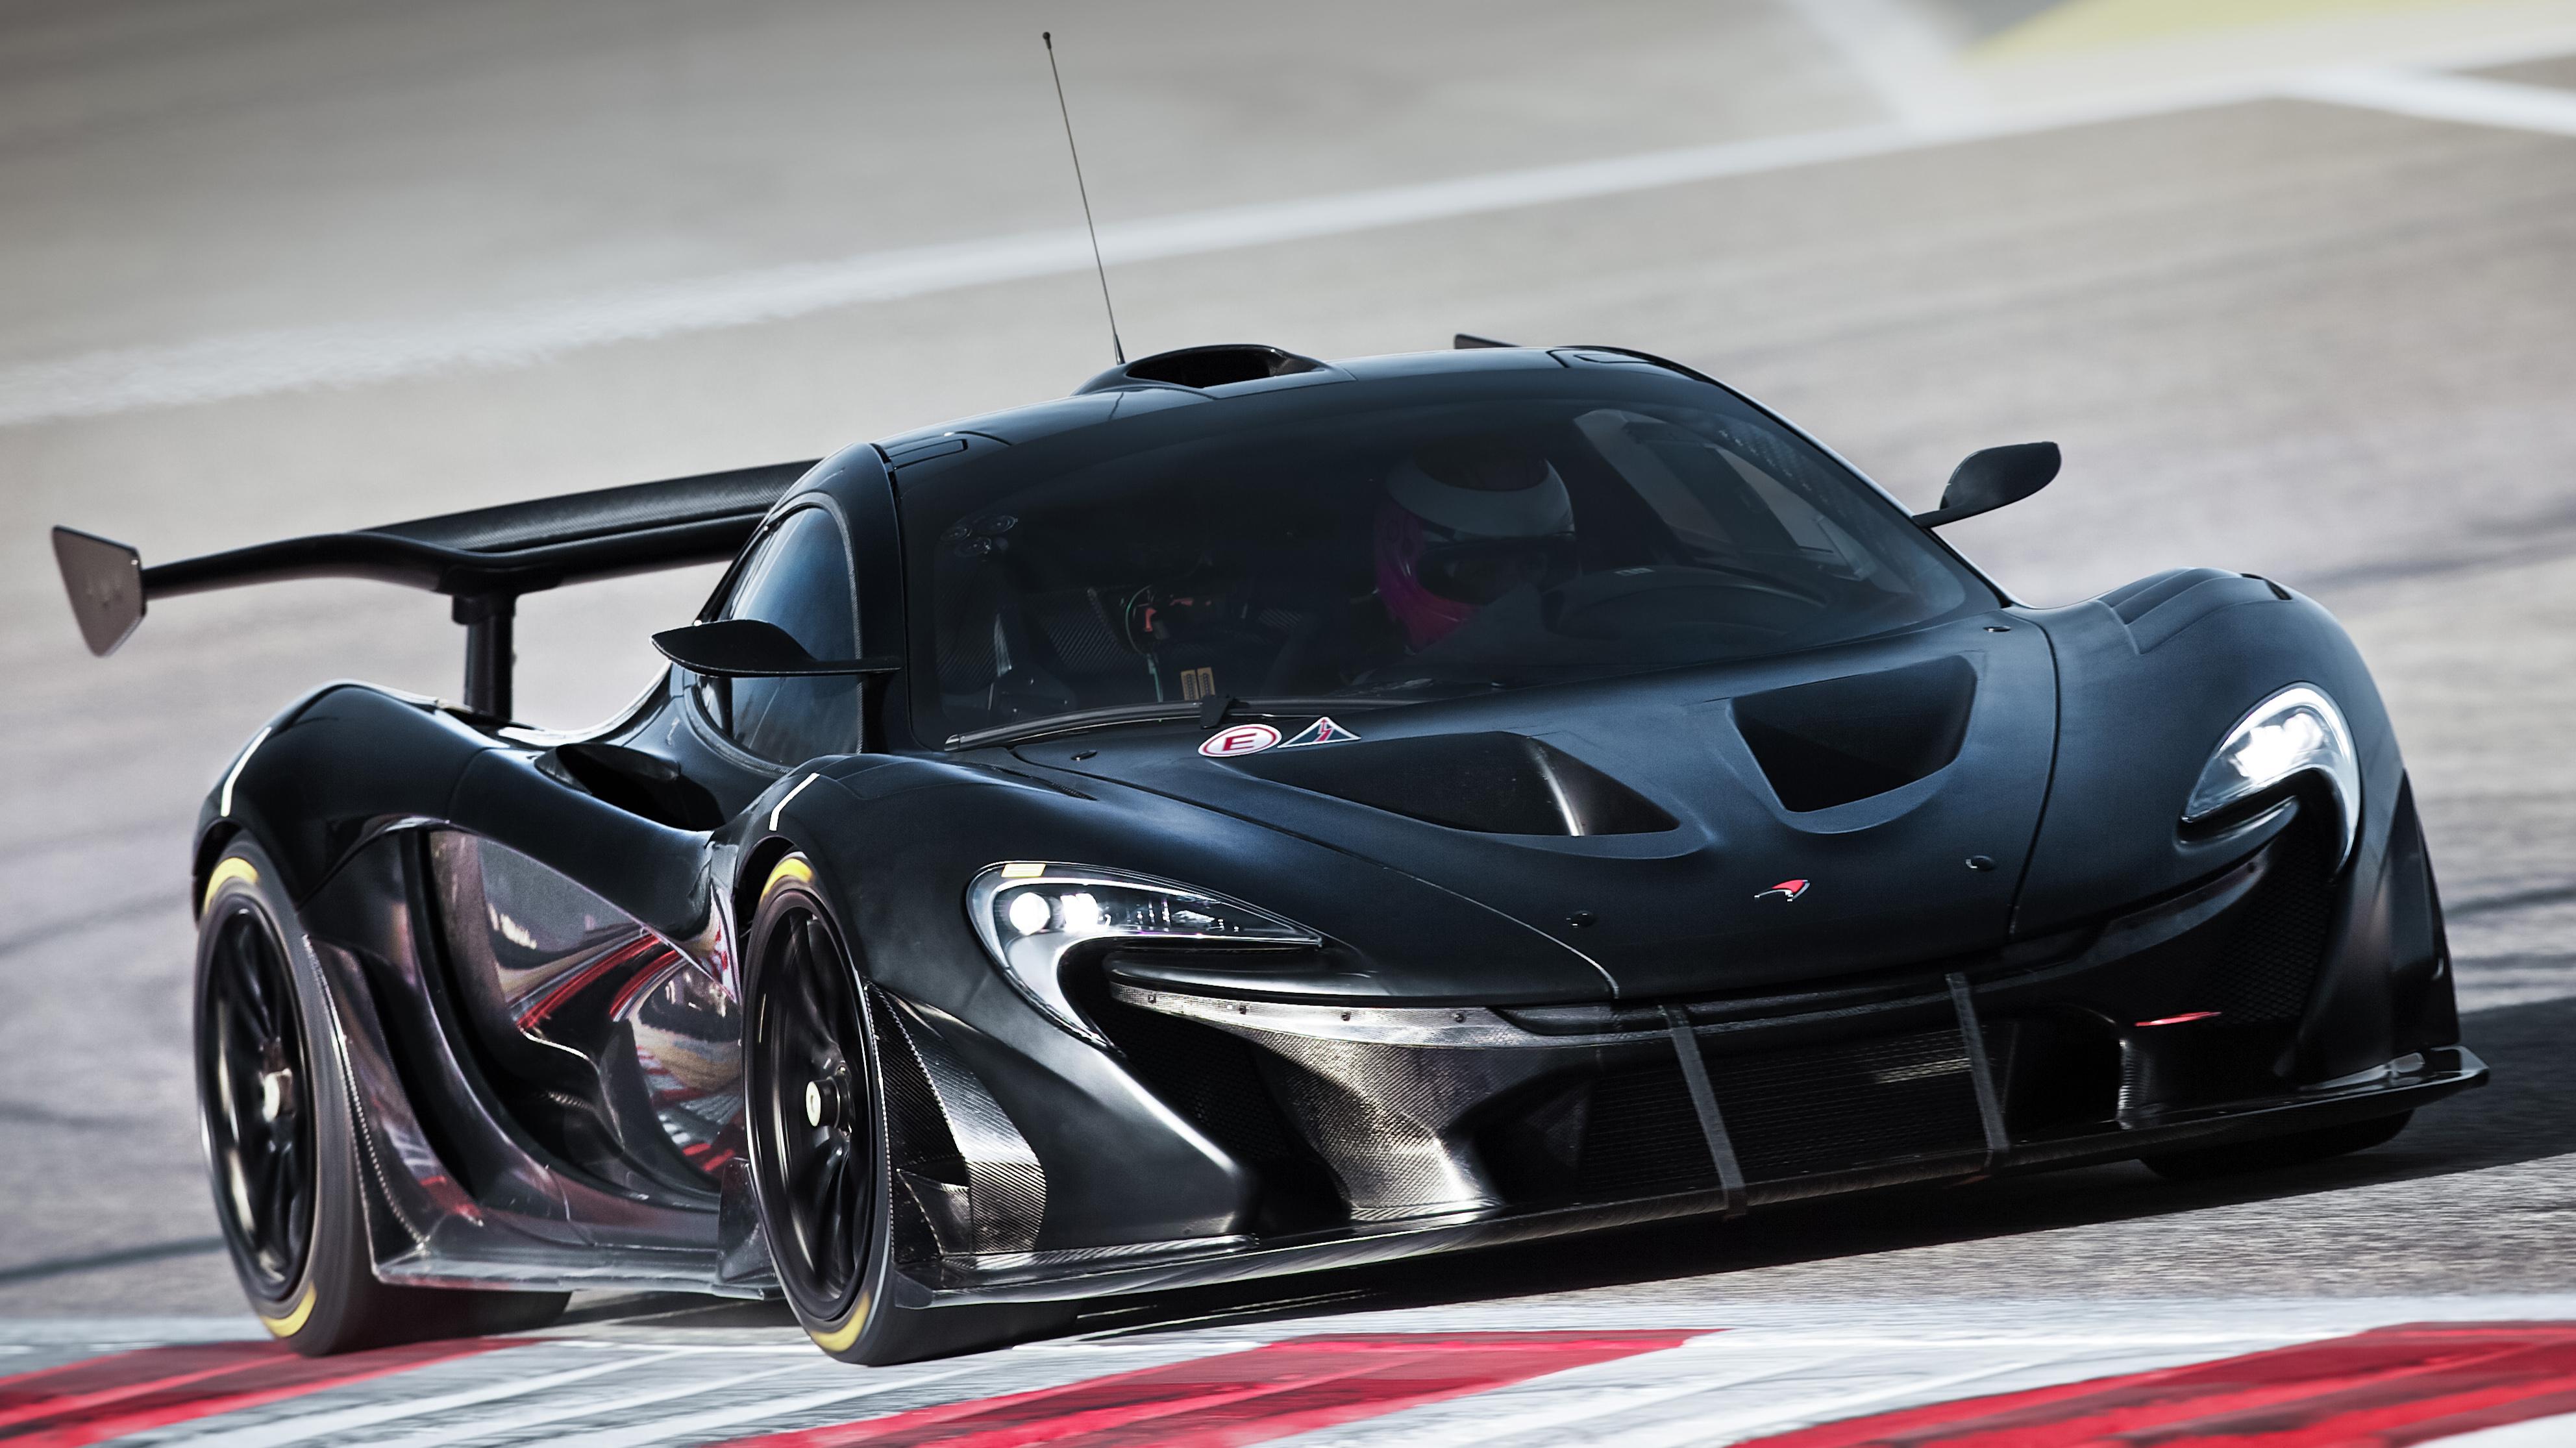 McLaren planning 'brutal' new P15 hypercar